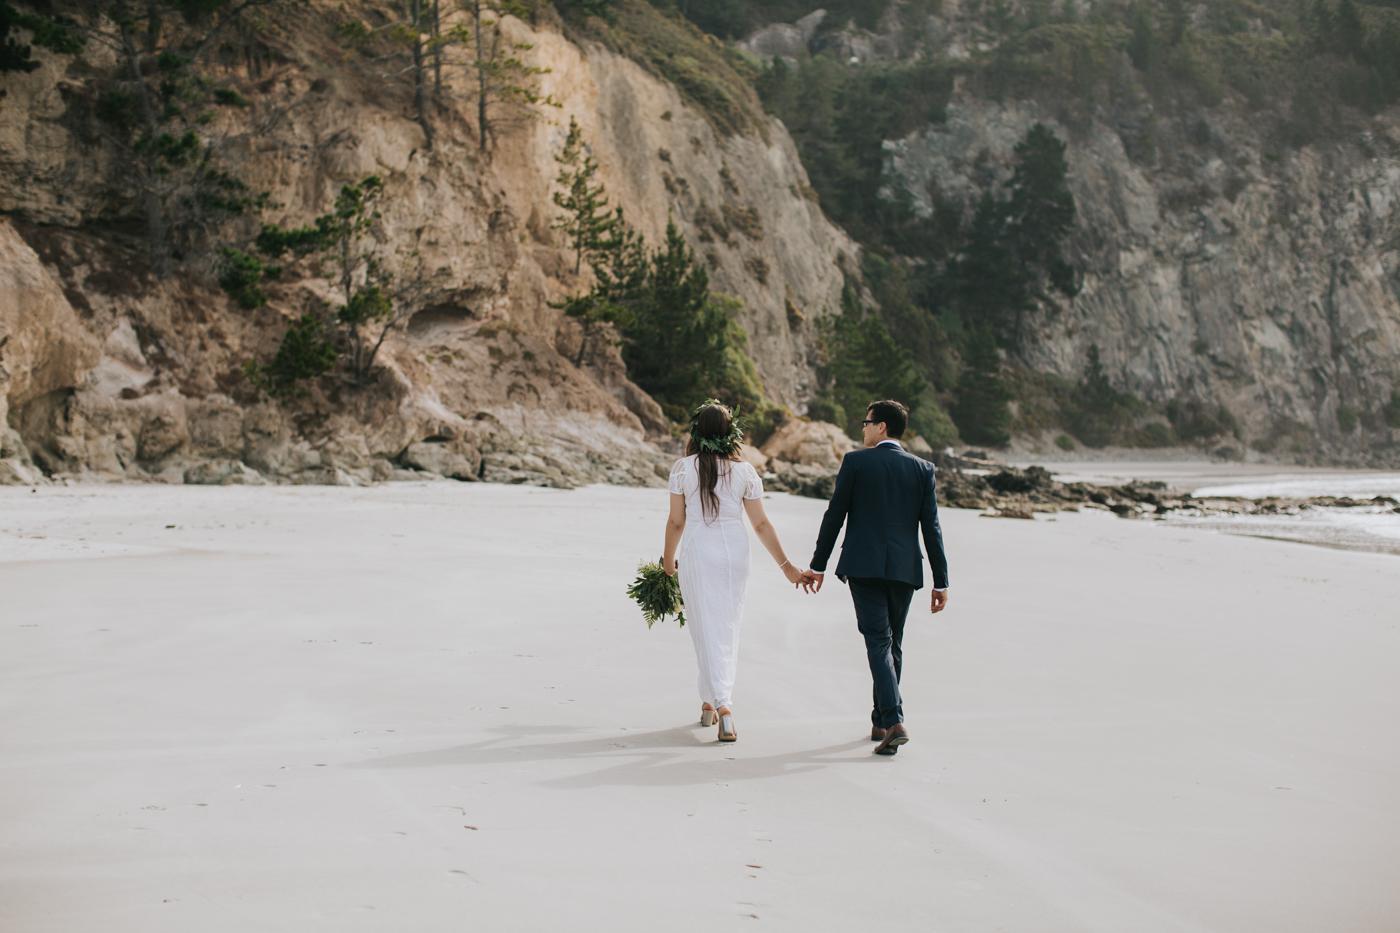 Ariana & Tim - Dunedin, New Zealand Wedding - Destination Wedding - Samantha Heather Photography-146.jpg